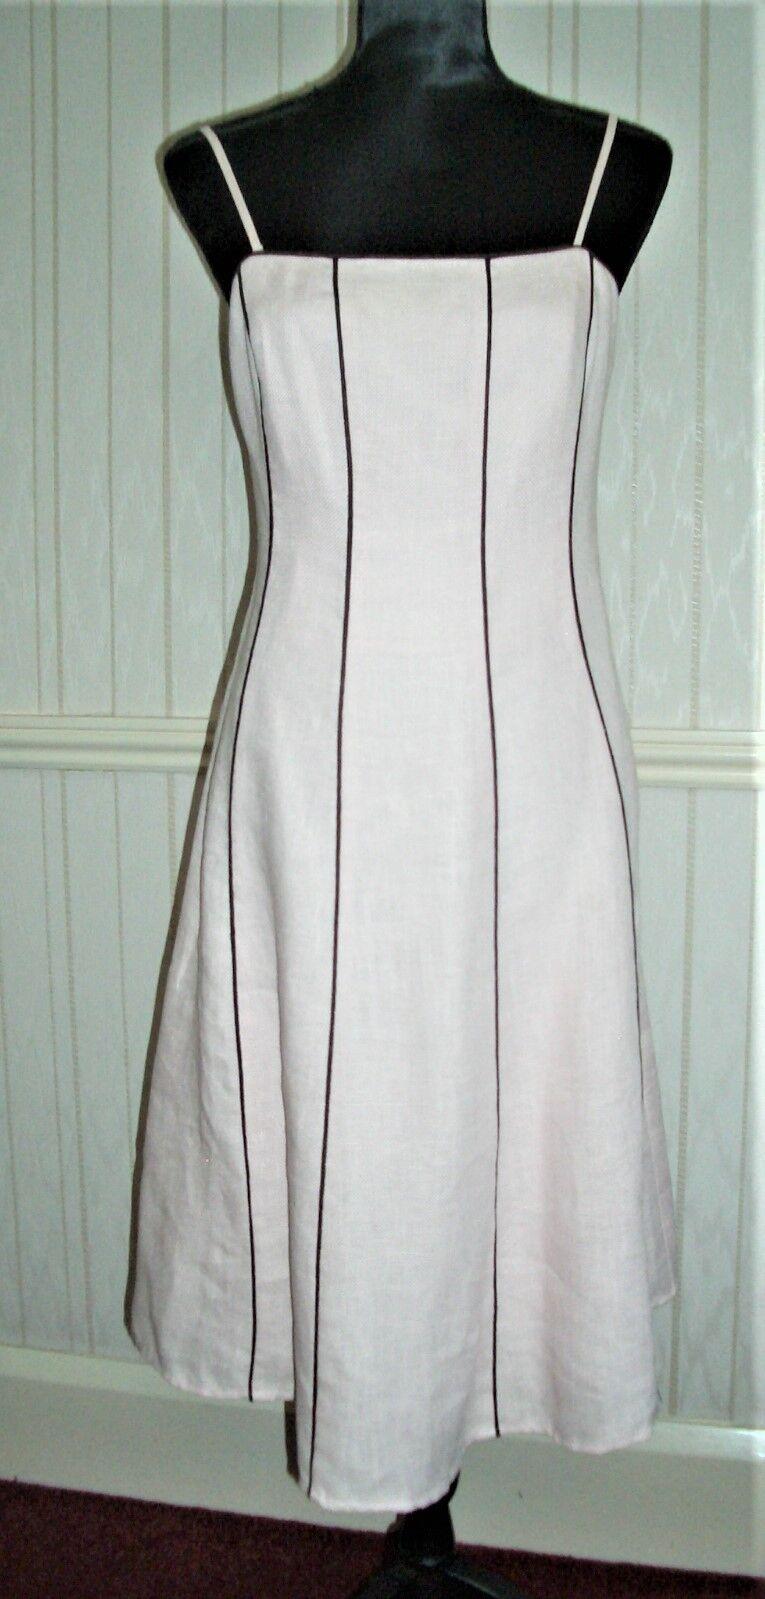 Fen Wright Mason Ladies Pale Pink Linen Dress Size 12